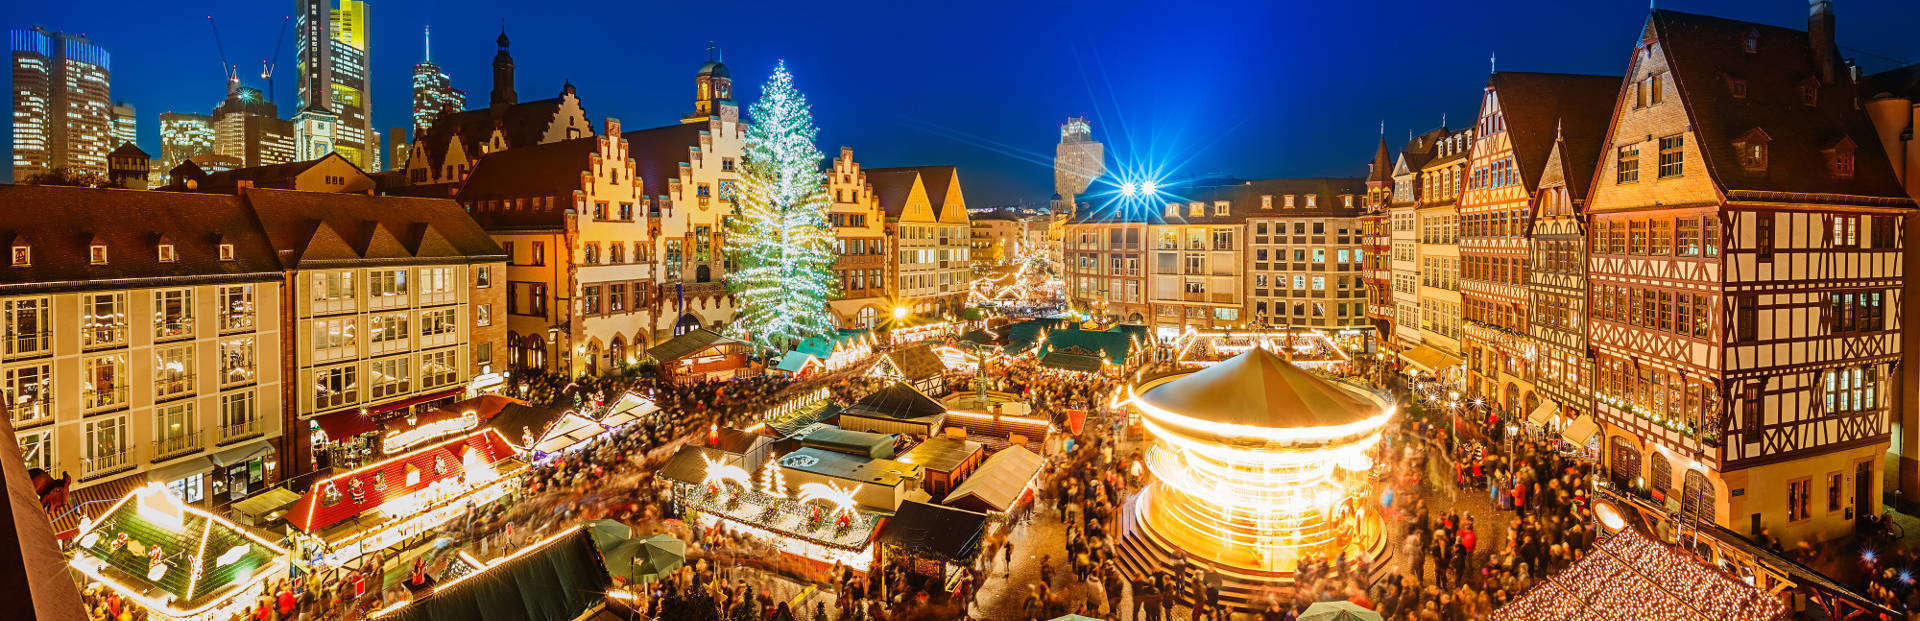 winter_market